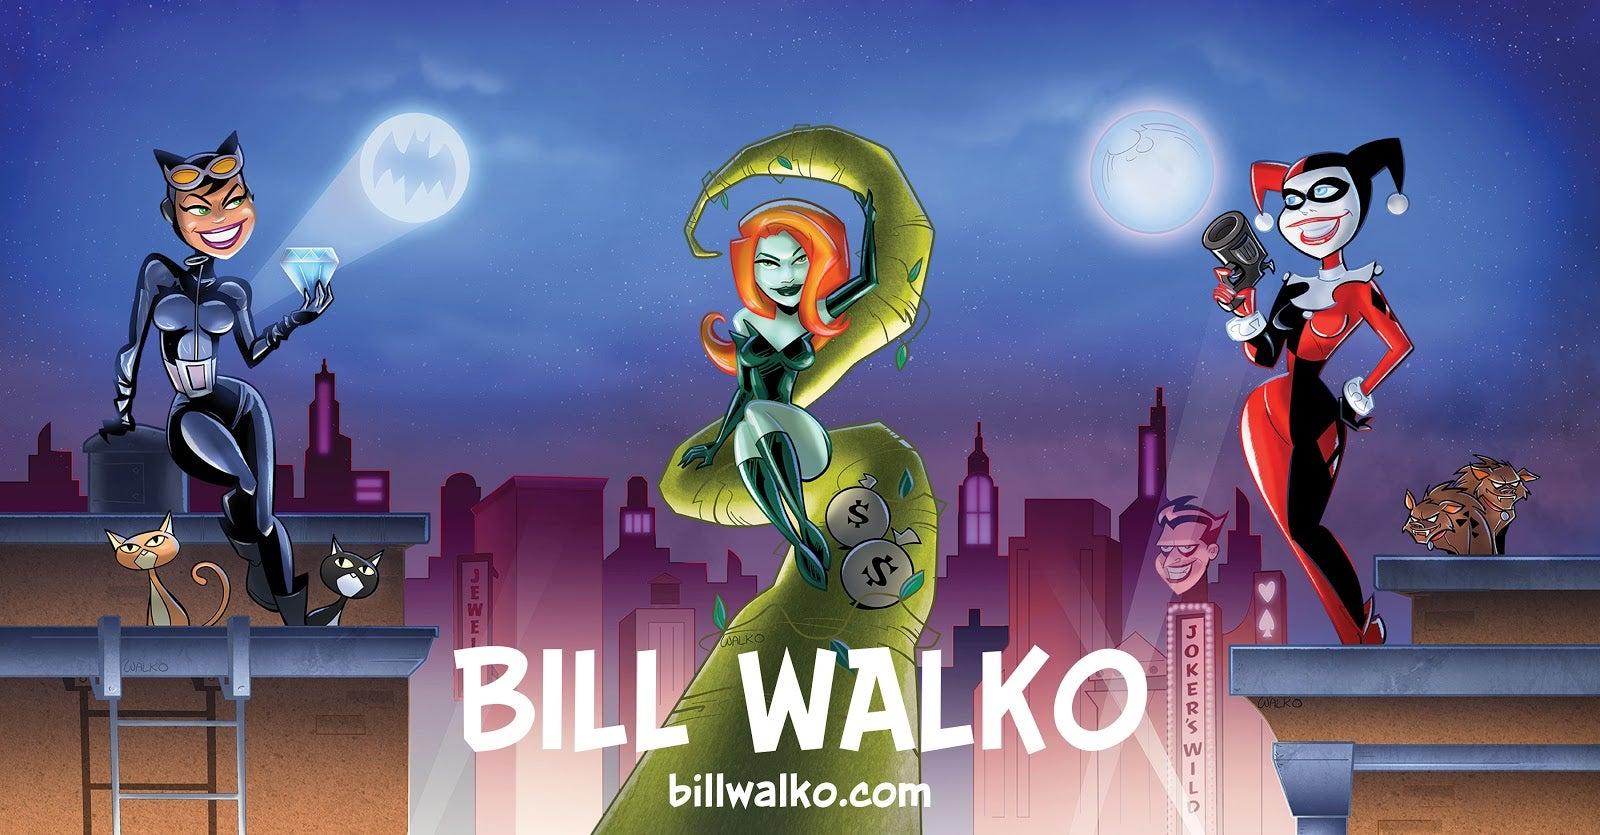 Bill Walko